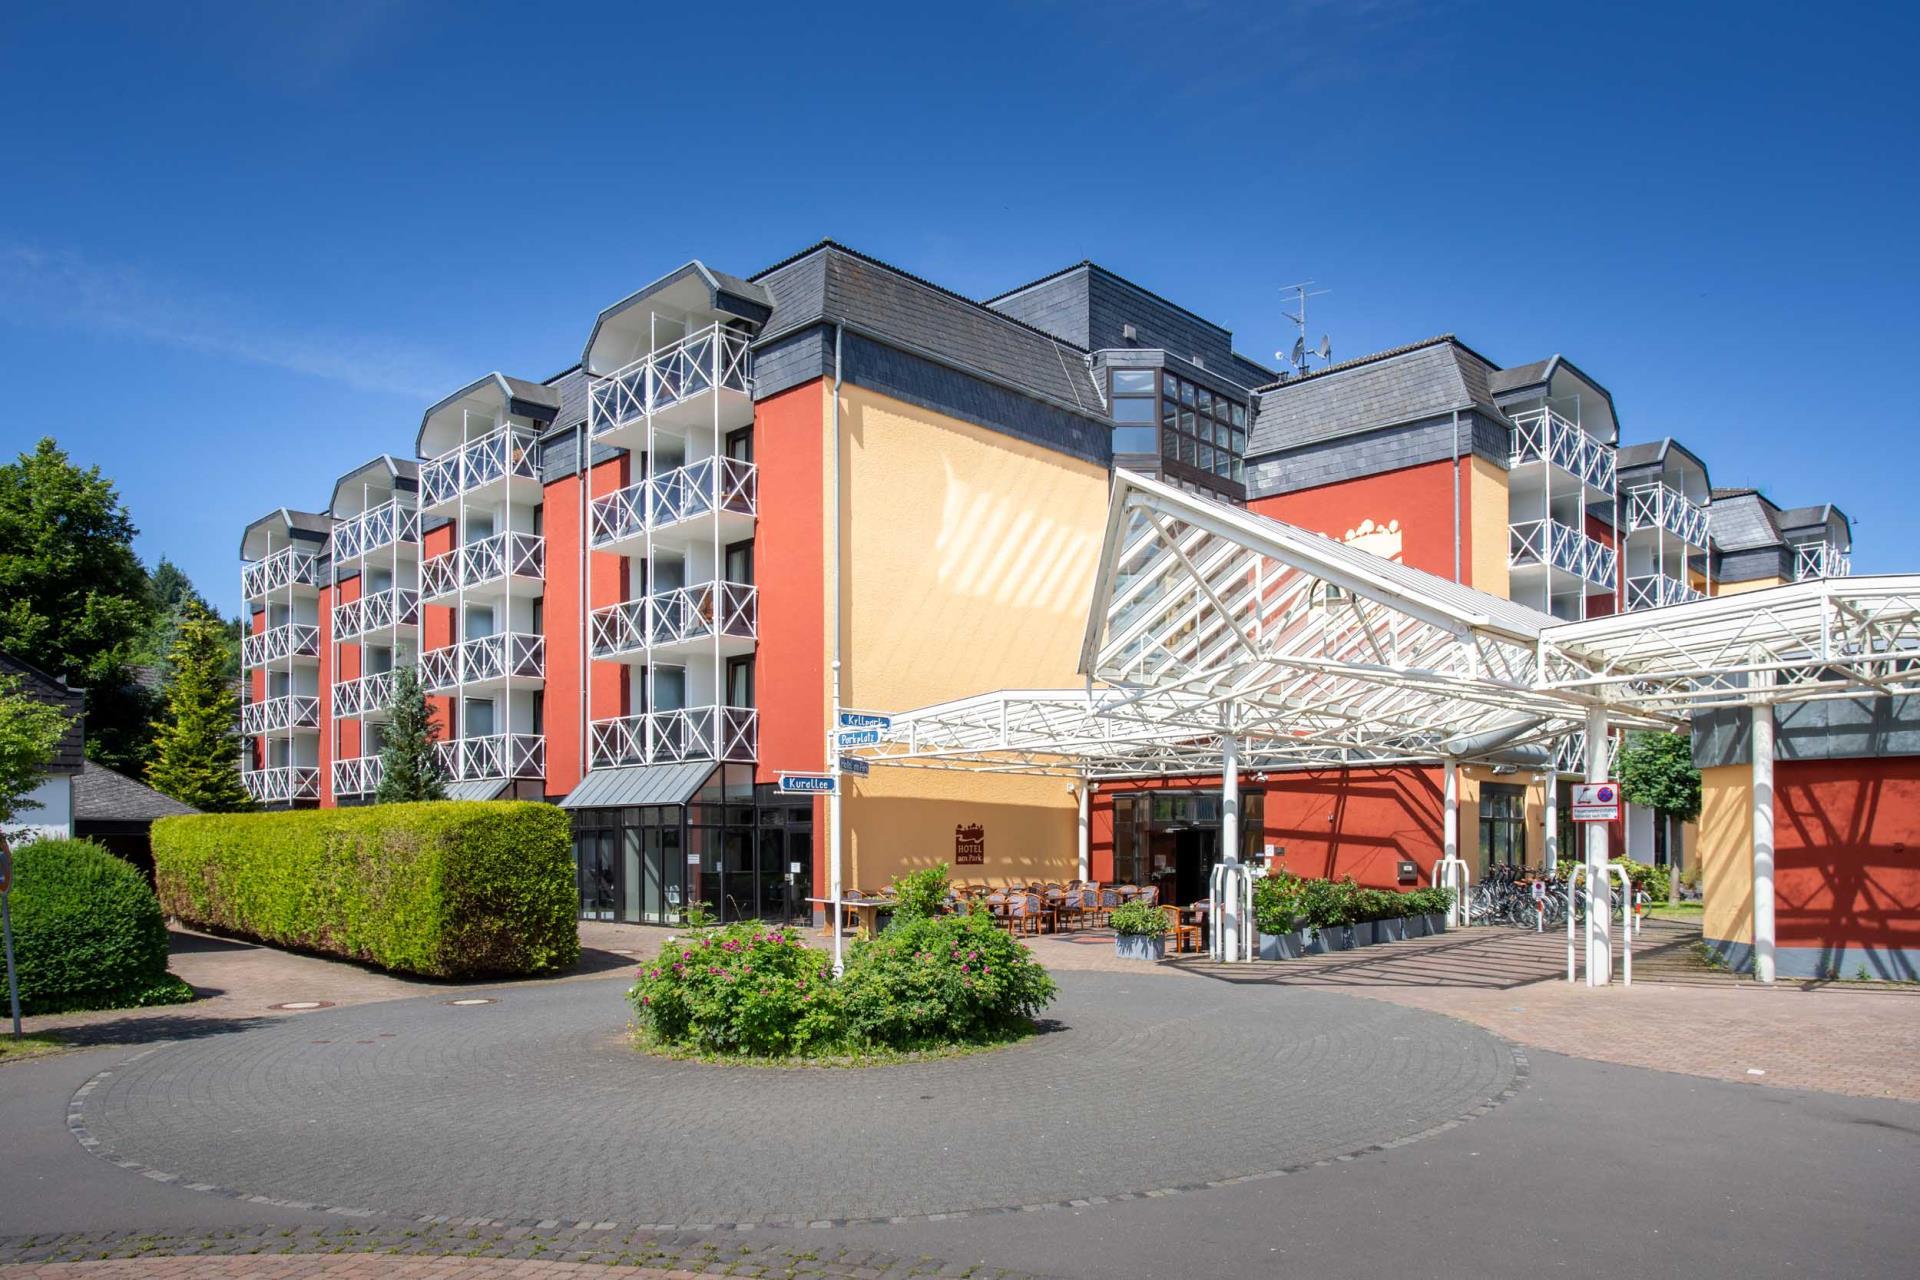 Hotel Am Park Stadtkyll - SOON ONLINE